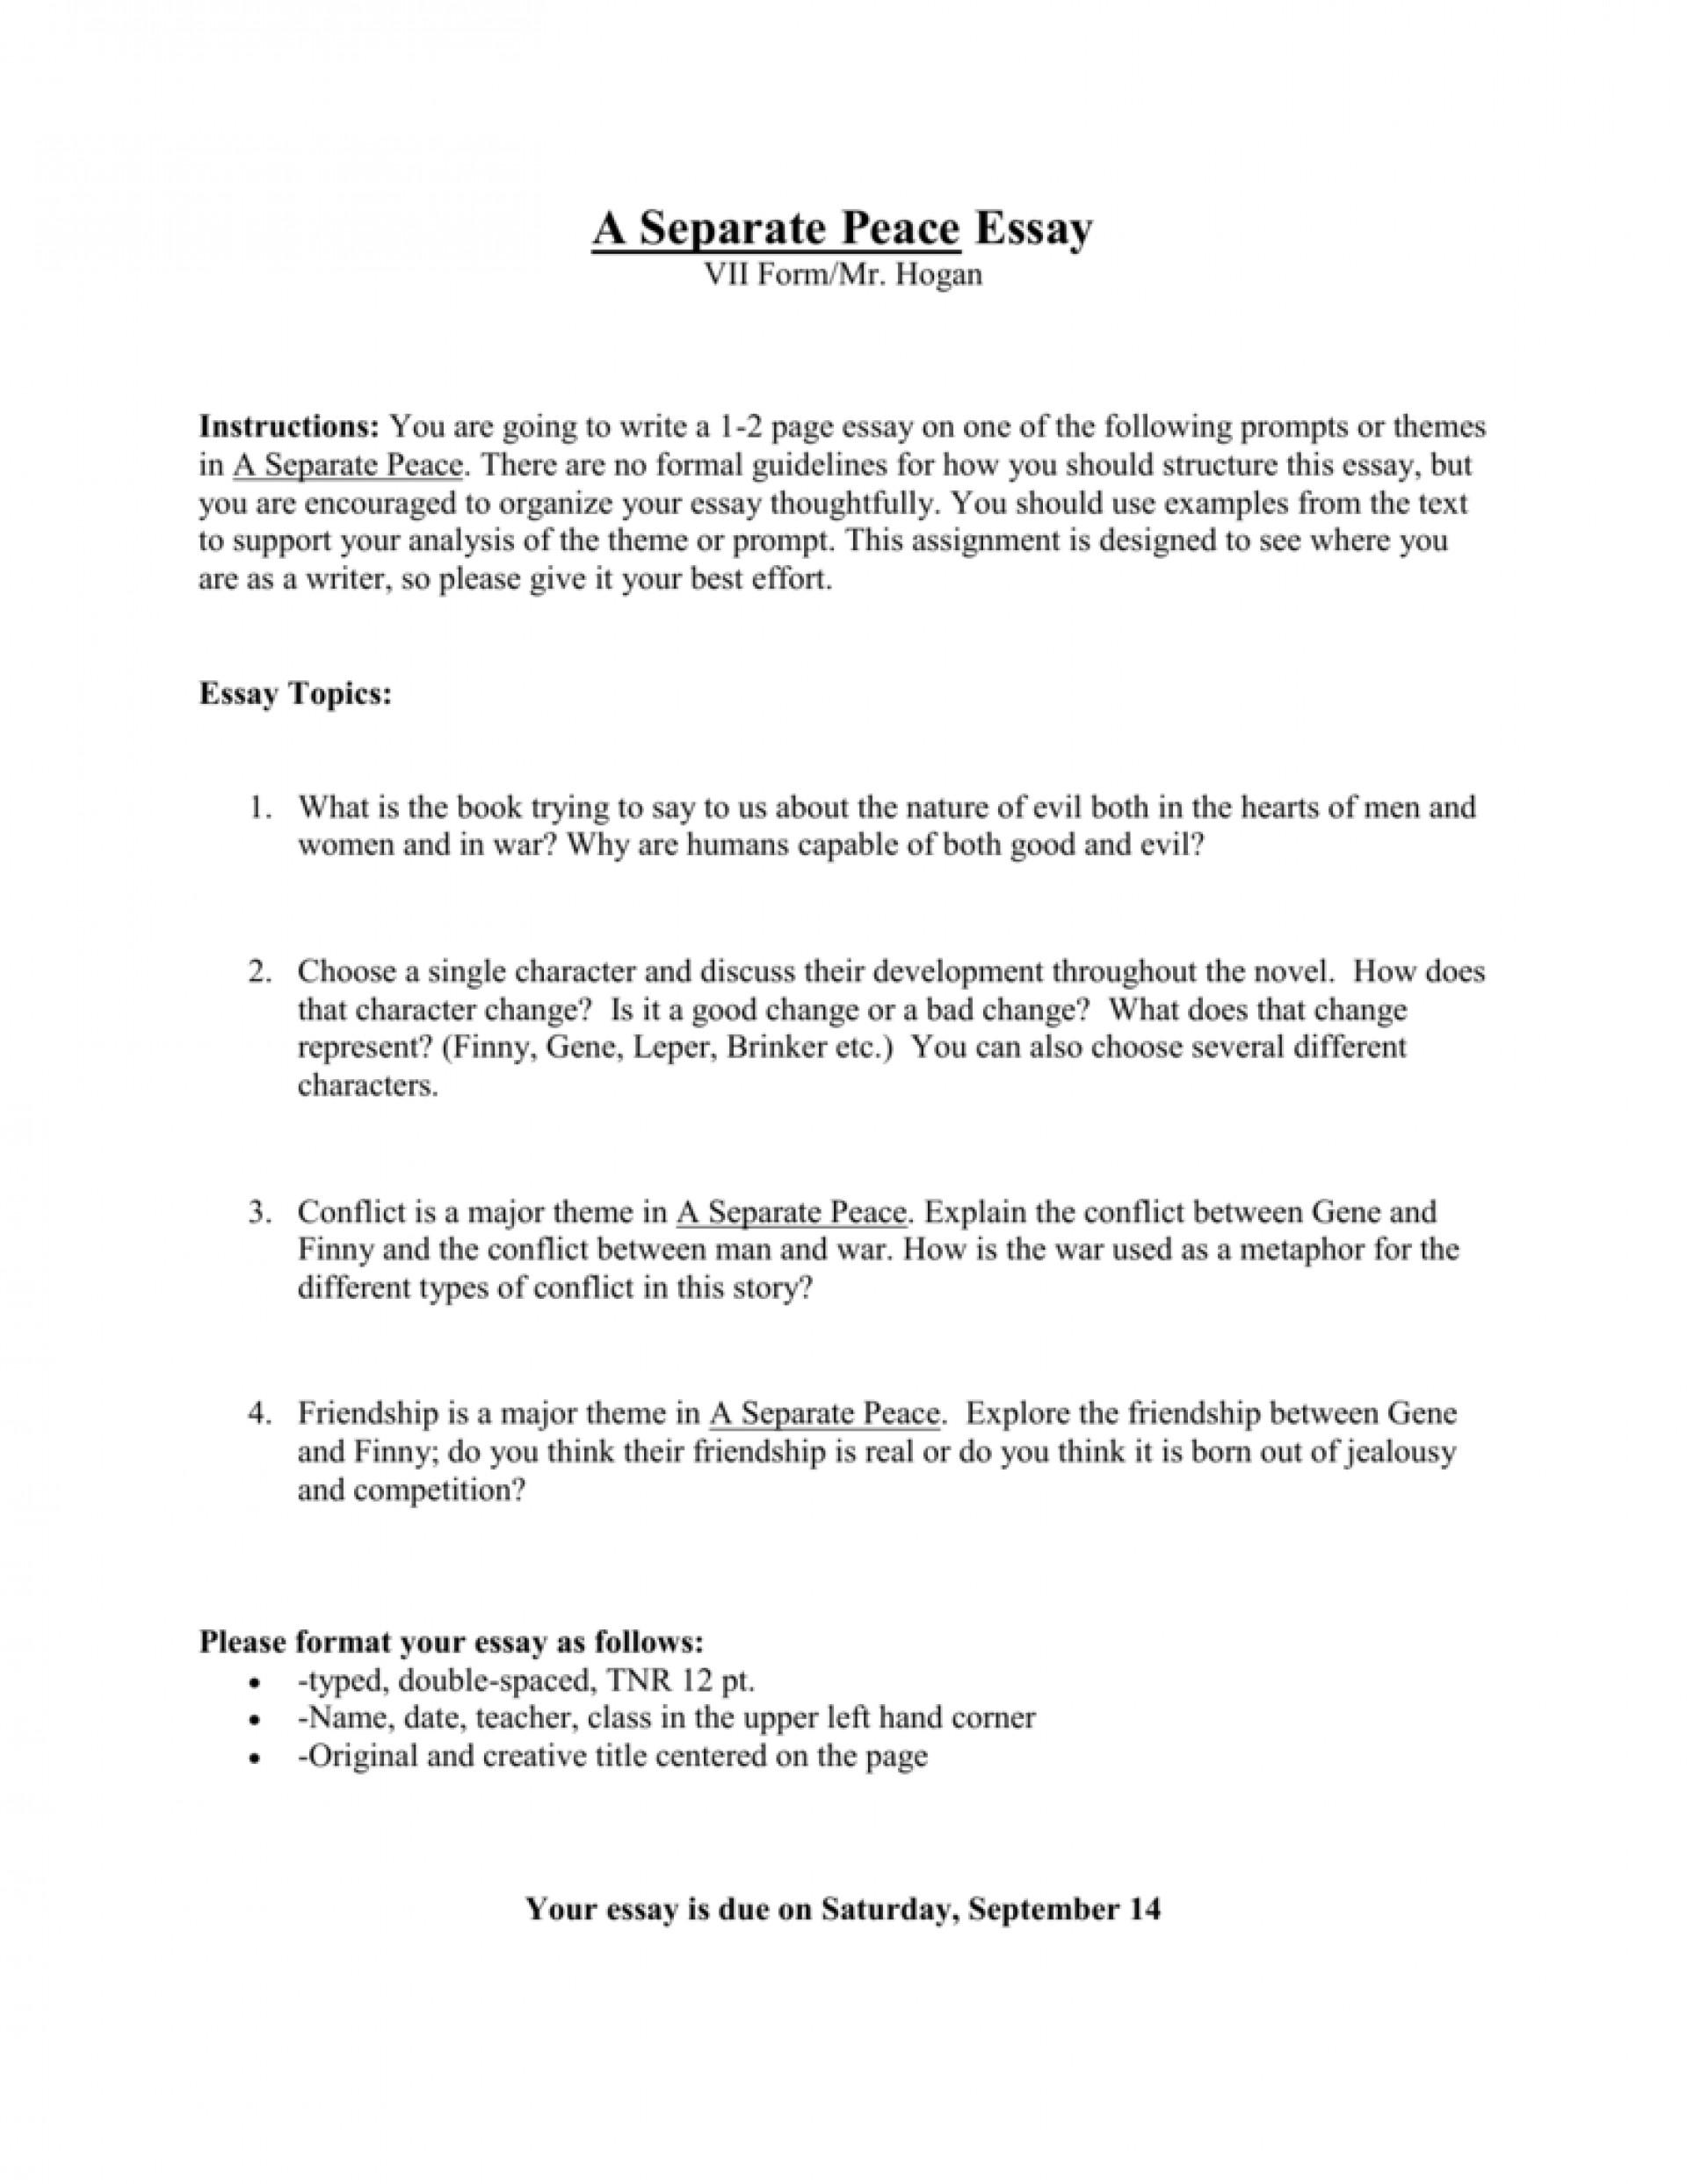 A separate peace essay topics